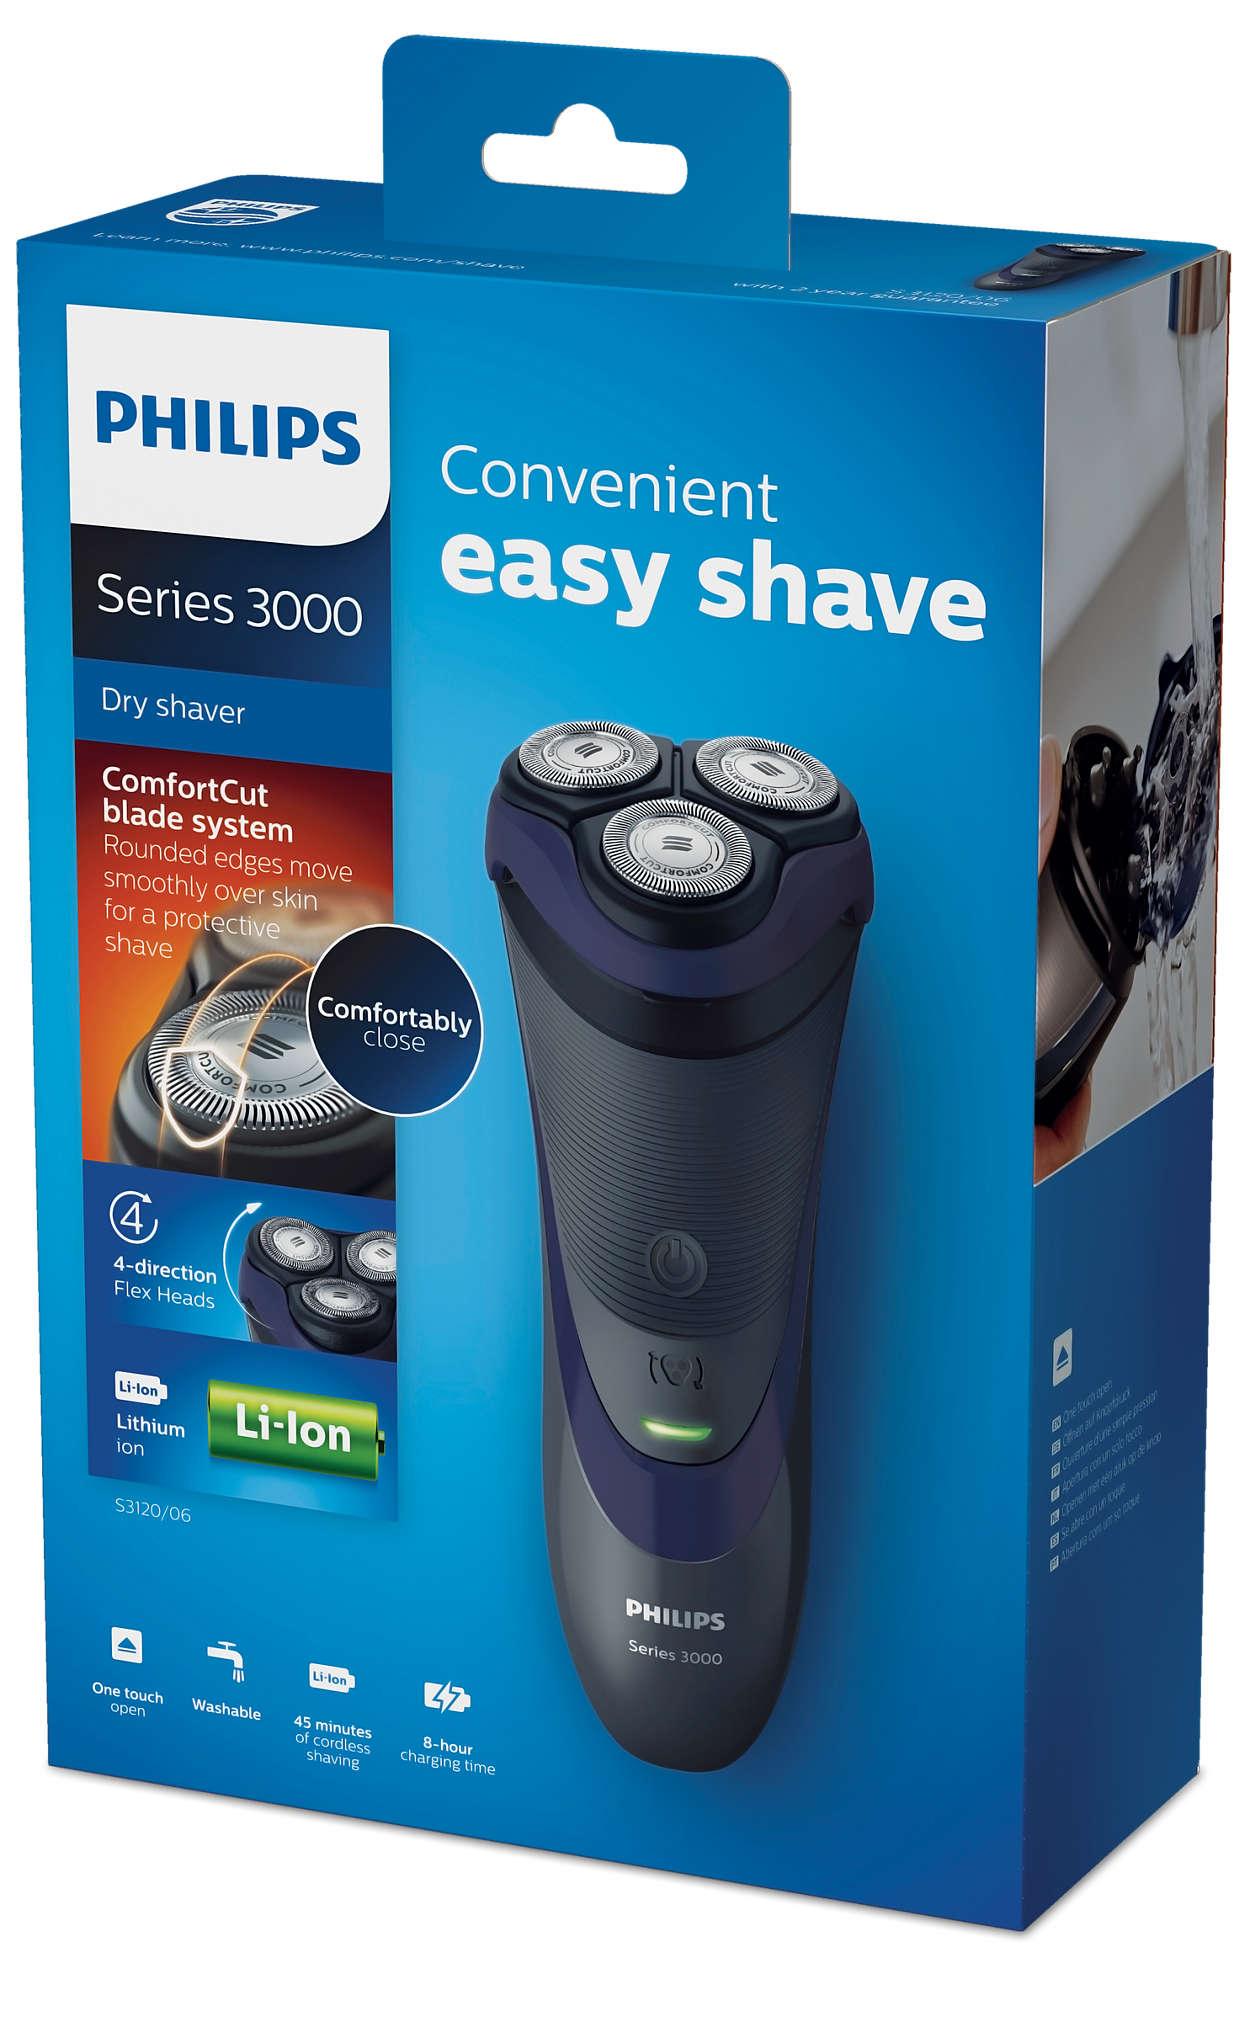 Afeitadora Philips S3120/06 SERIE 3000 (Carrefour)